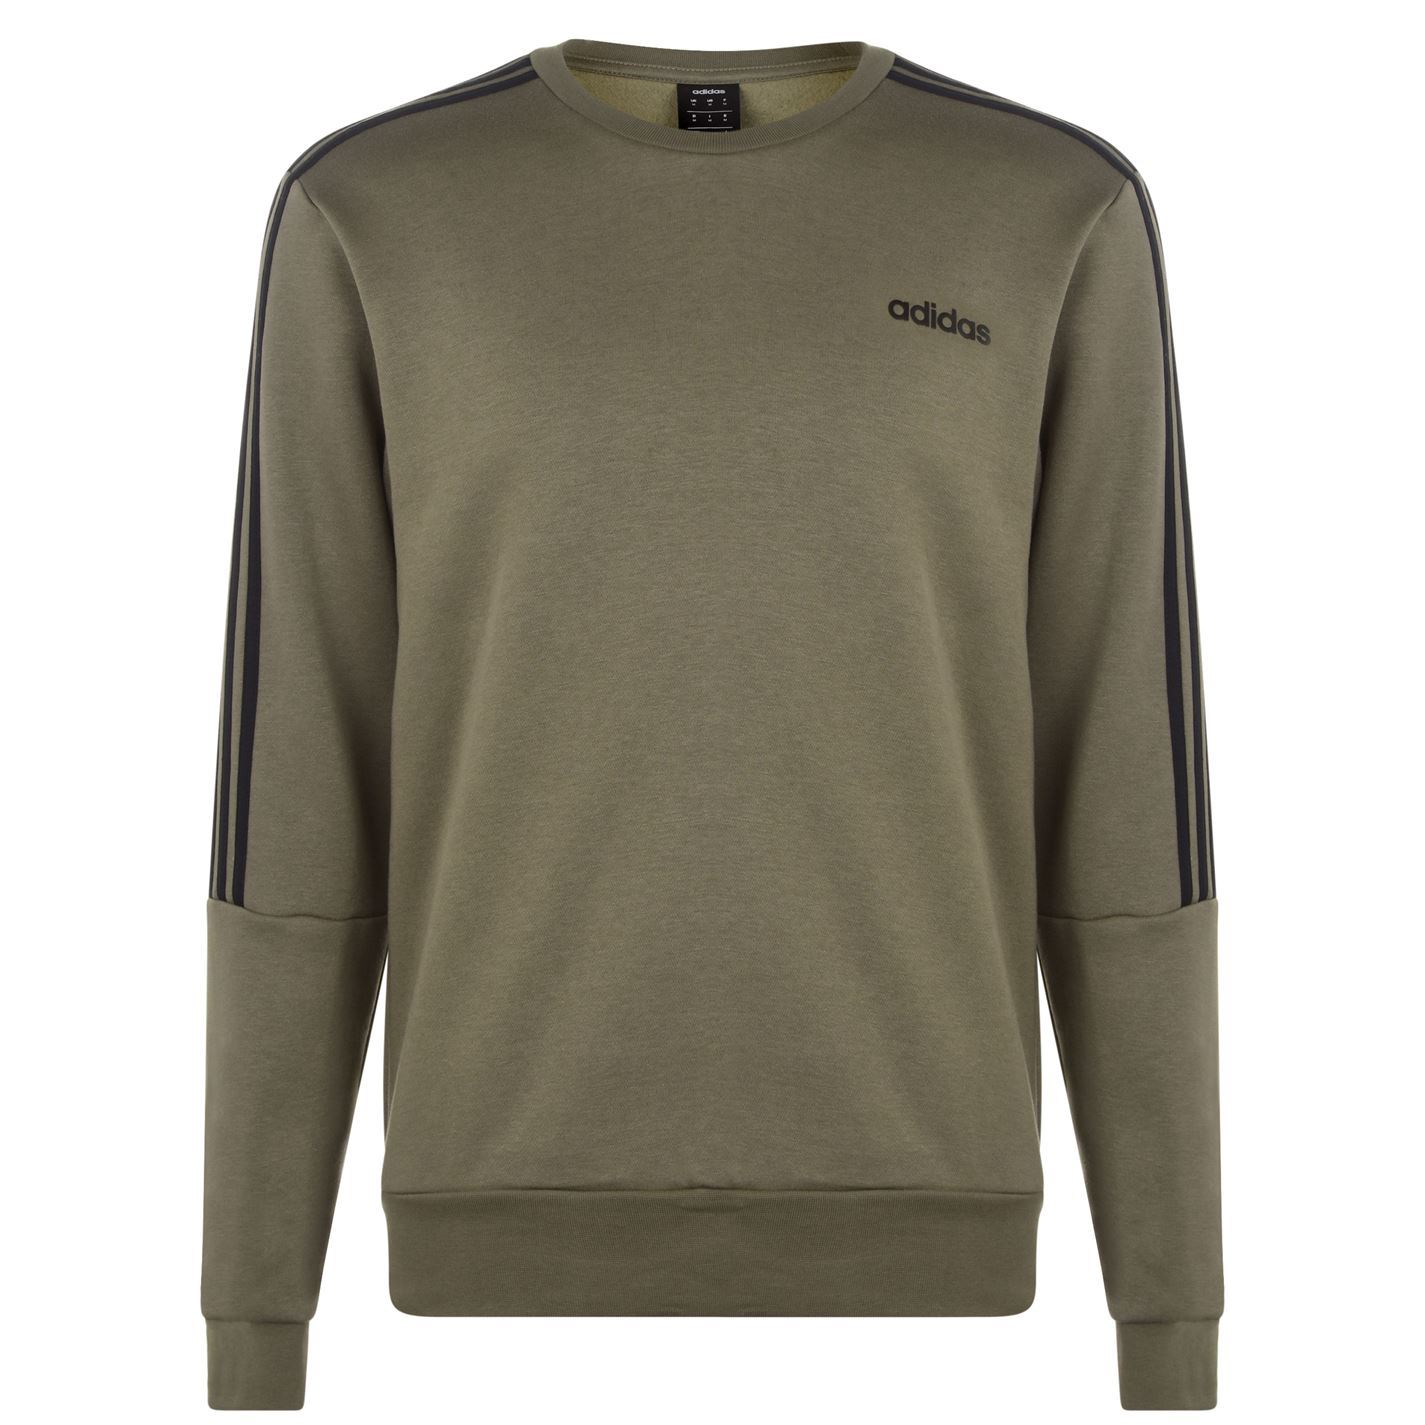 Details about adidas 3 Stripes Crew Sweatshirt Mens KhakiBlack Top Sweater Jumper